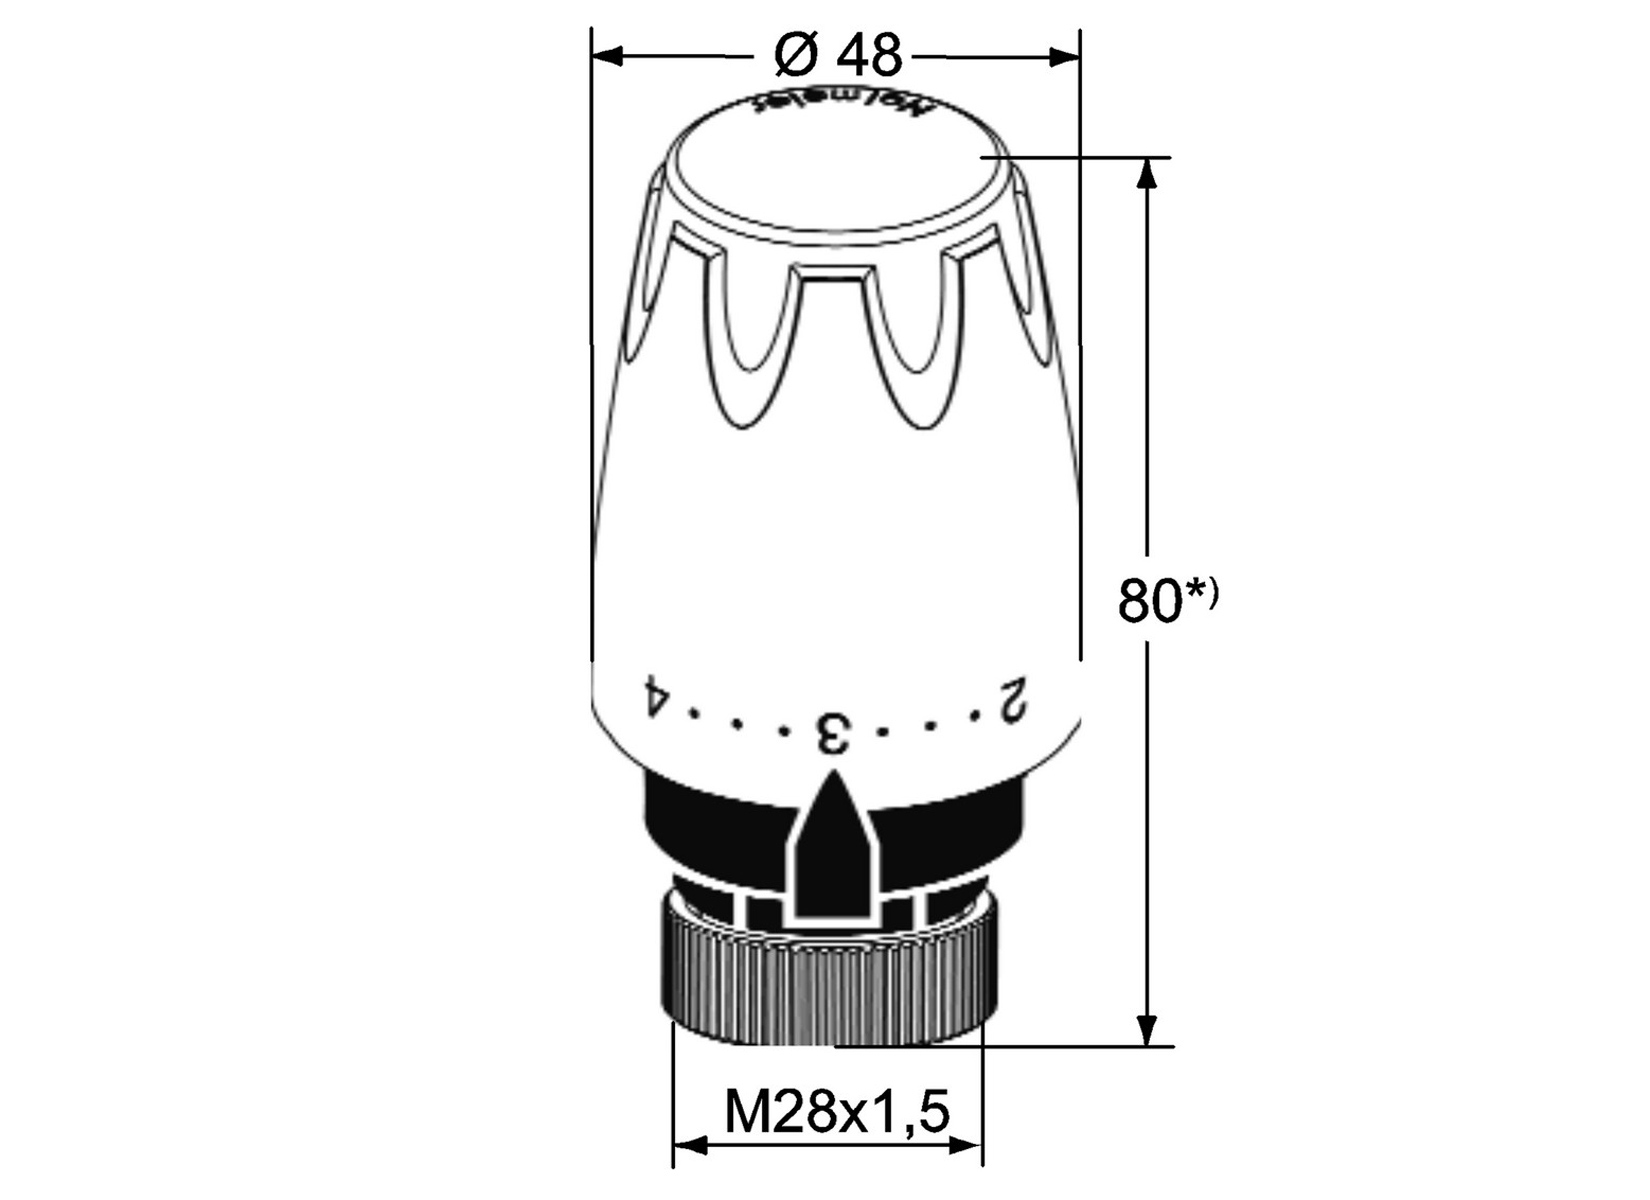 AV-KI-BETT MATRATZE 140x70 CM SOFT KOMBI